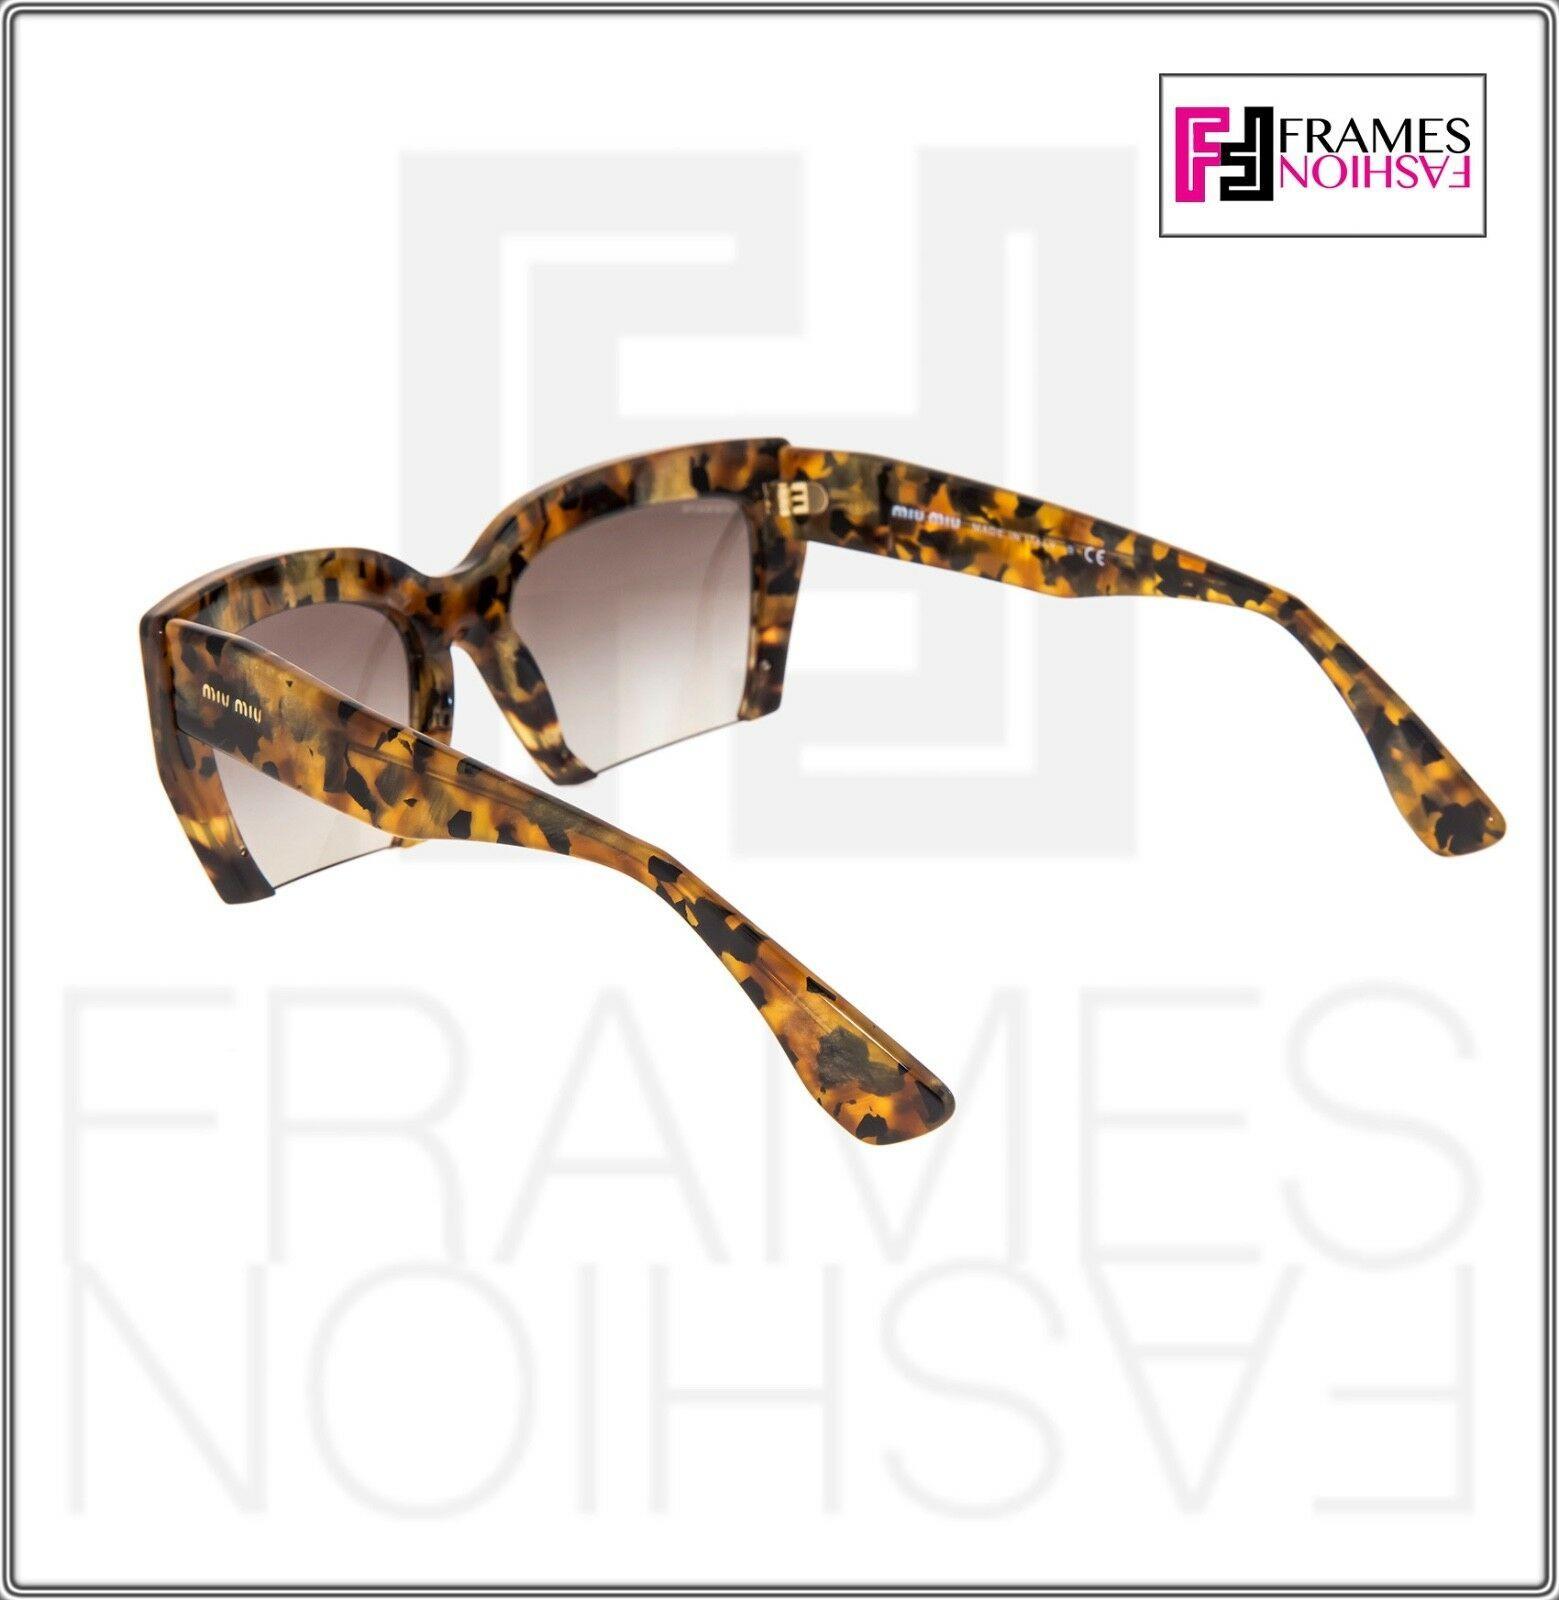 MIU MIU RASOIR 11O Square Sunglasses MAN-0A7 Caramel Marble Sunglasses MU11OS image 3